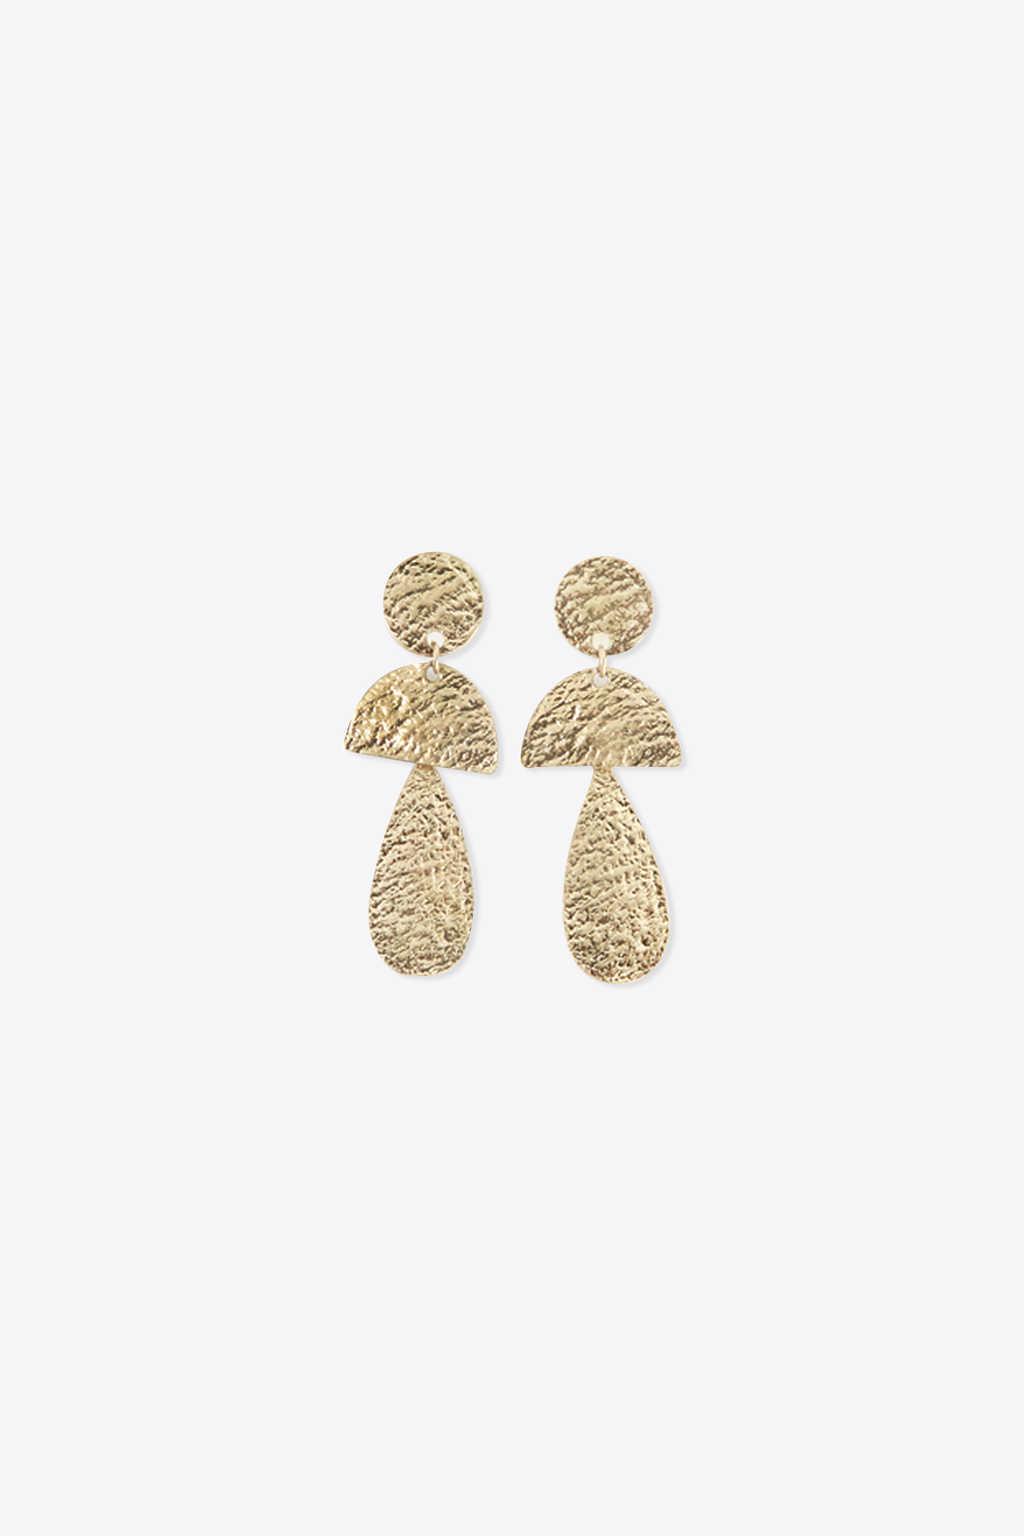 Earring H006 Gold 2